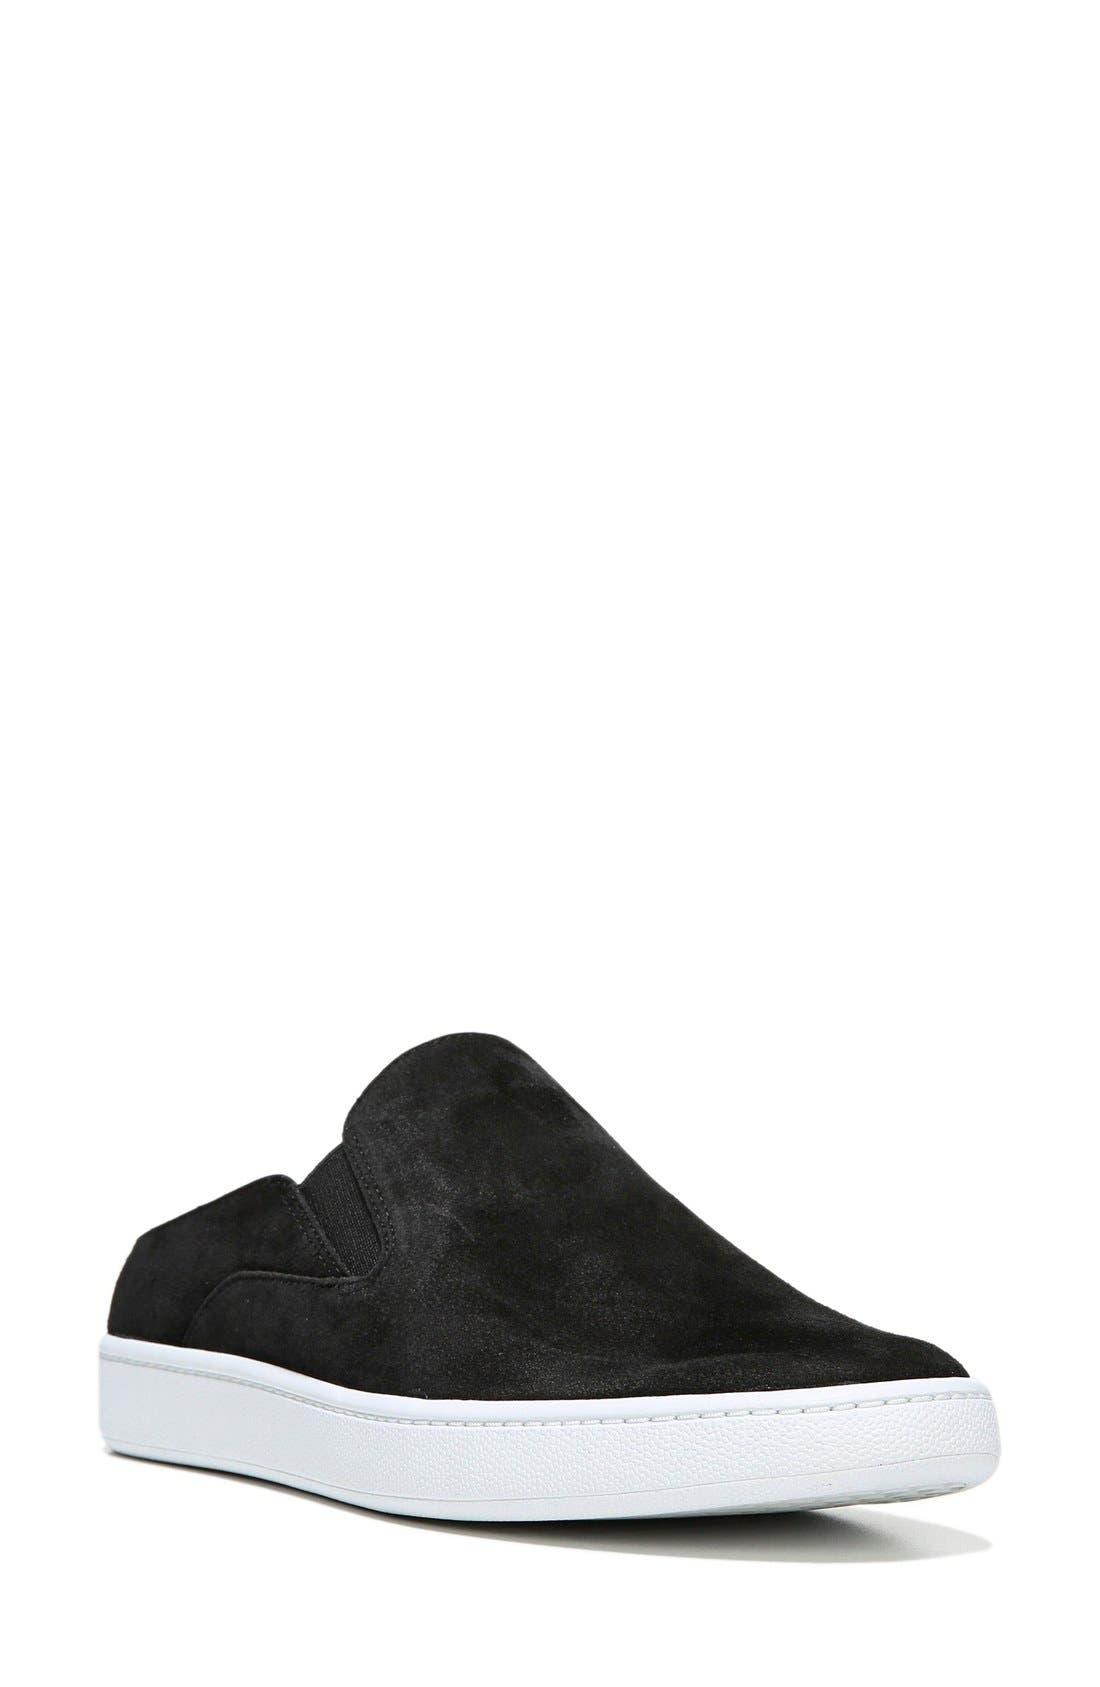 Verrell Slip-On Sneaker,                         Main,                         color, BLACK SUEDE